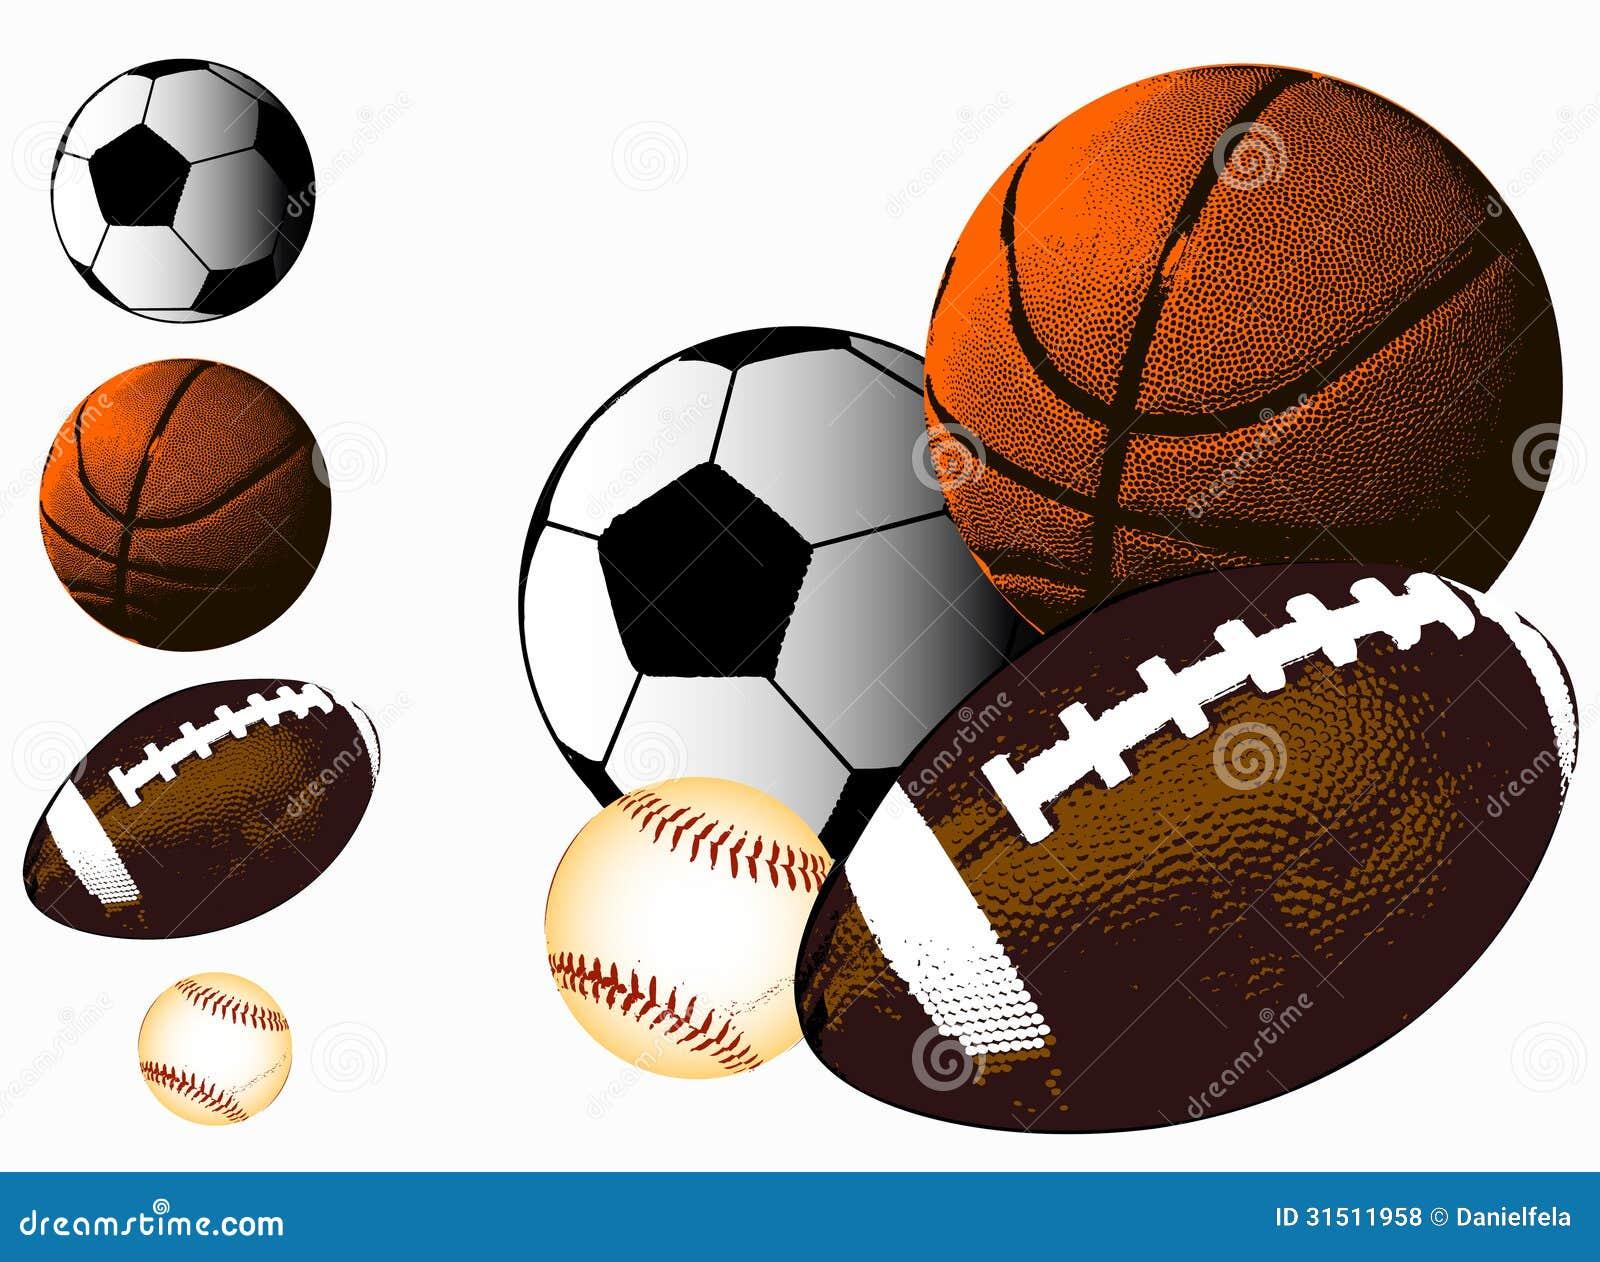 the wynn sportsbook foot boll sport